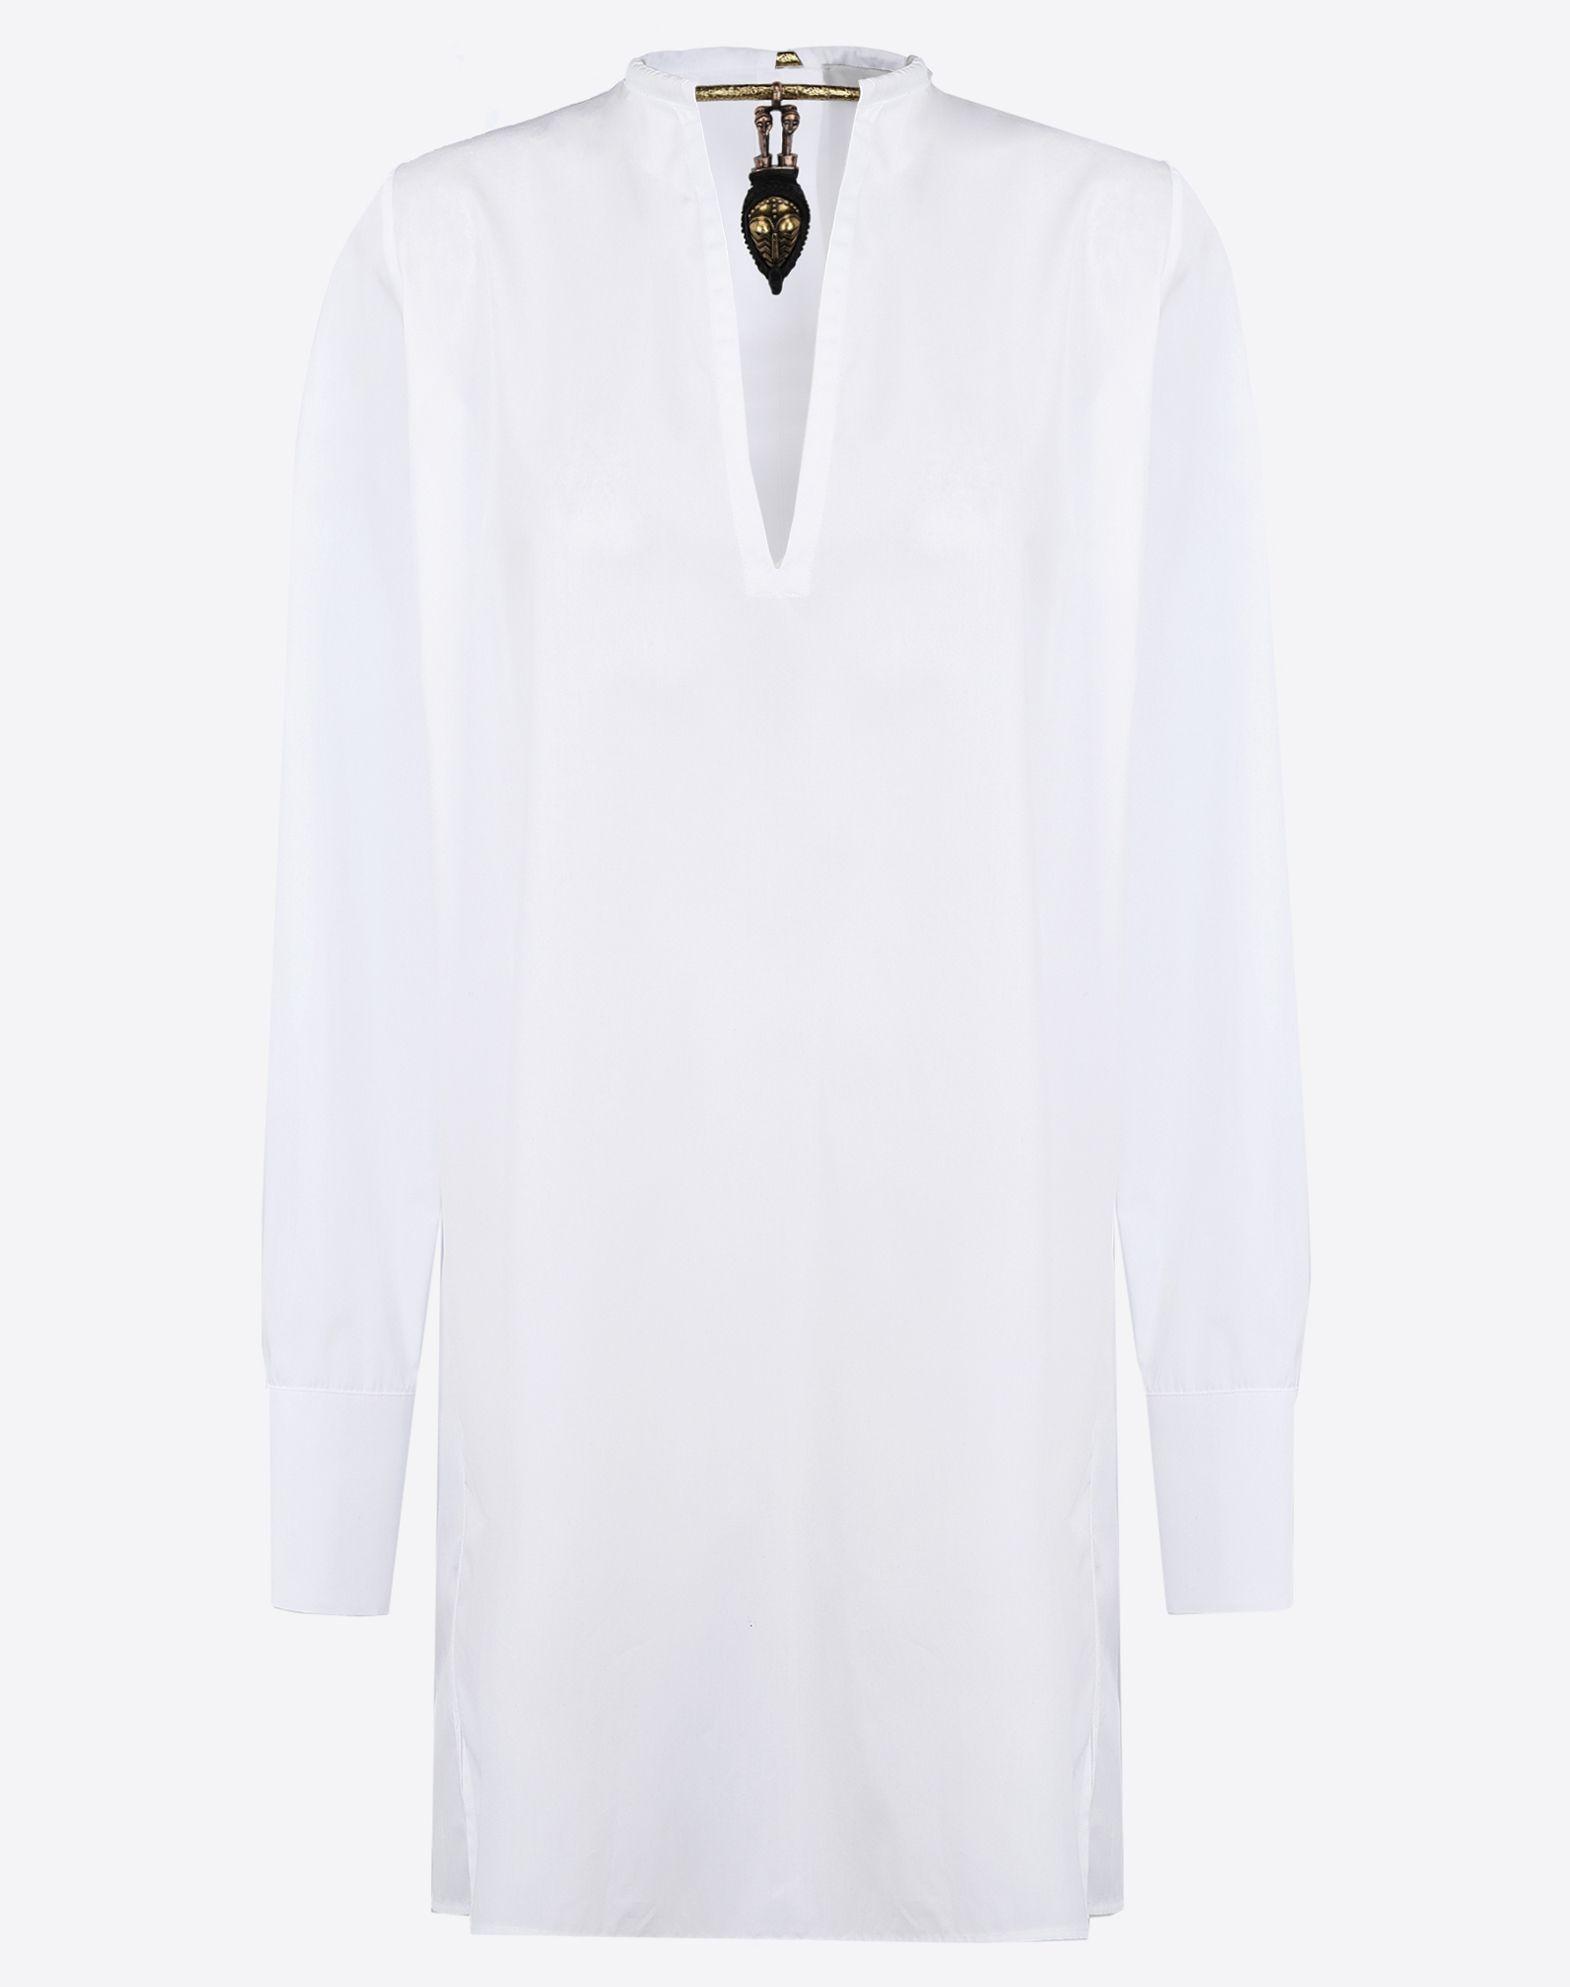 VALENTINO Plain weave Solid color V-neckline Dual cuffs Hook-and-eye closure Side slit hemline Long sleeves  38506937or